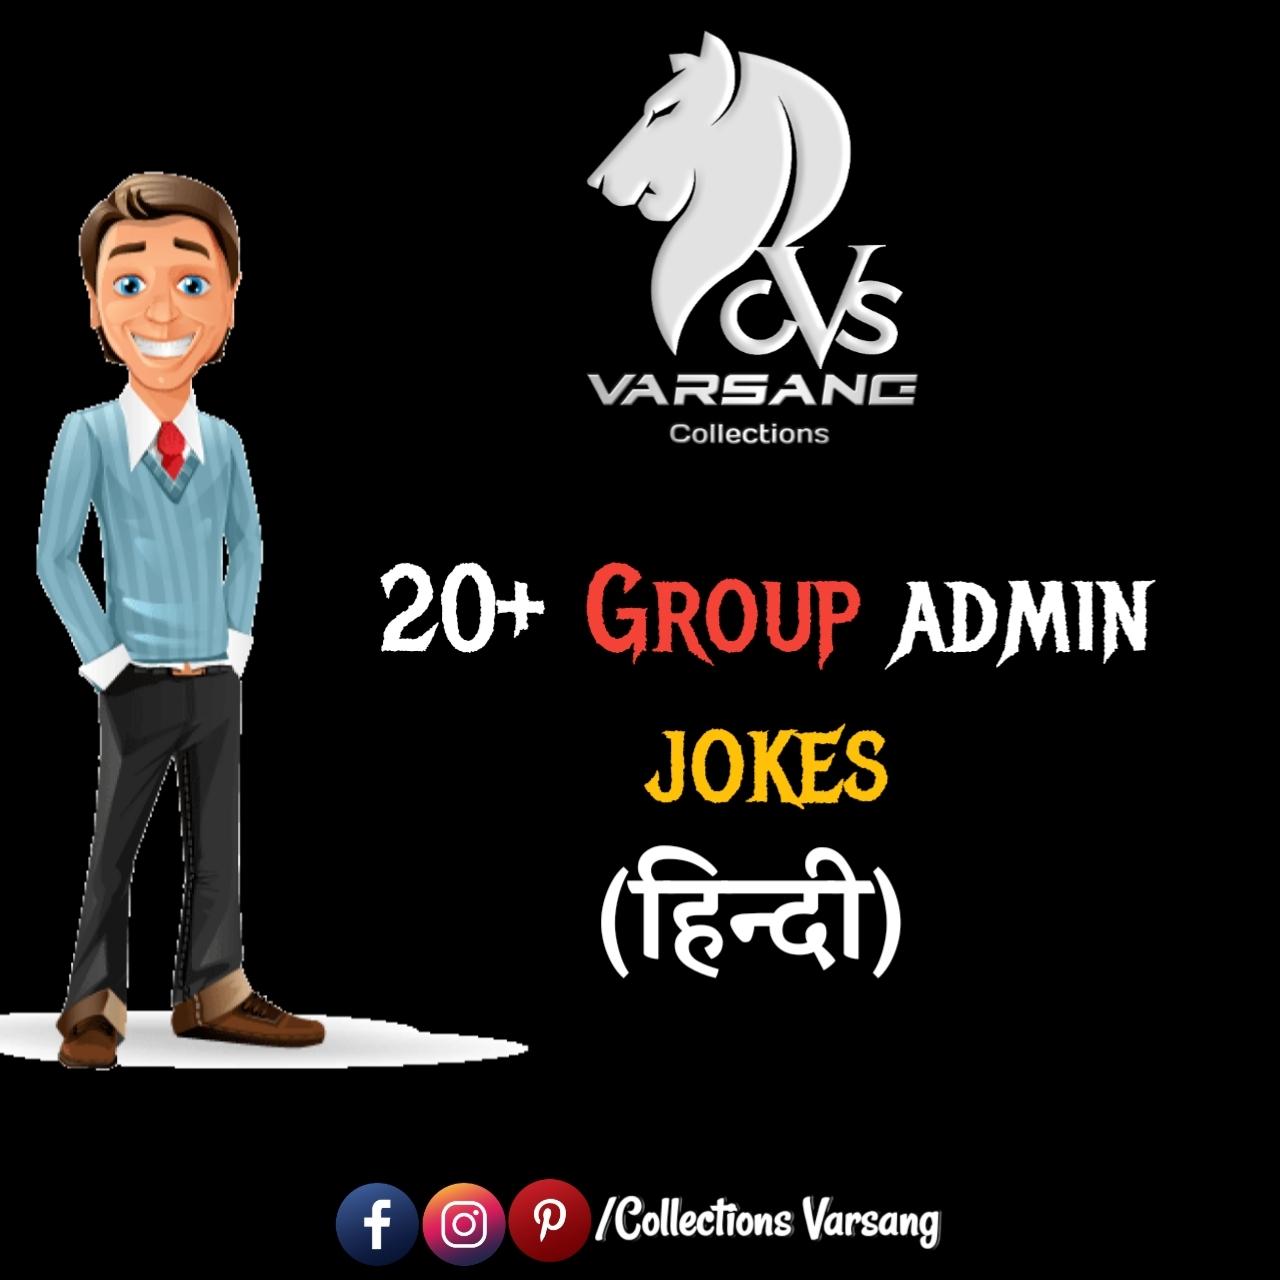 group-admin-jokes-in-hindi